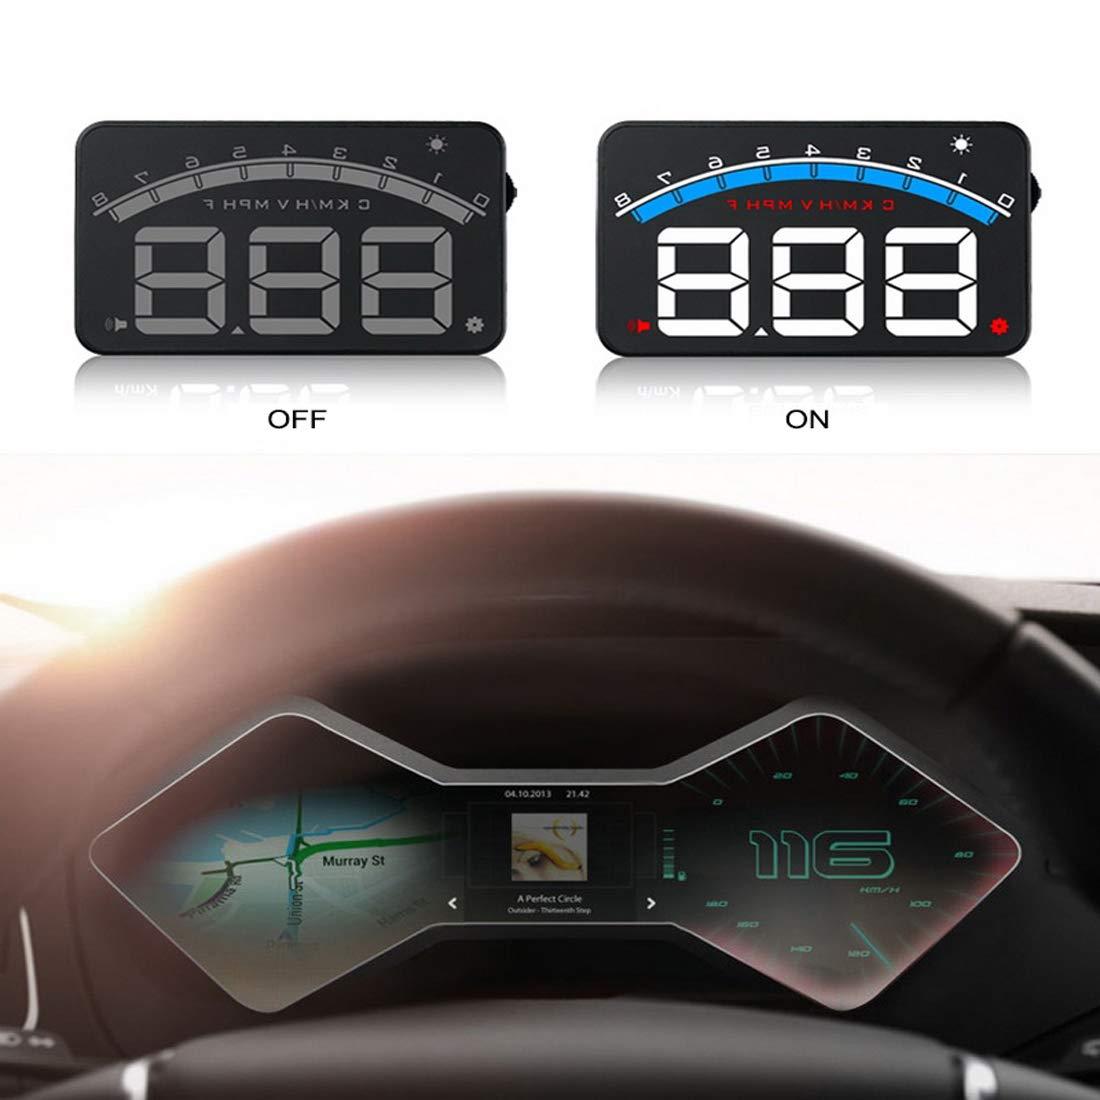 5-Zoll-Windschutzscheibenprojektor OBD2 EUOBD Autofahrdatenanzeige Geschwindigkeit RPM Wassertemperatur HUD-Anzeige HONGKANG DONGMAO CO LTD Auto-Elektronik DONGMAO M6 Head Up 3